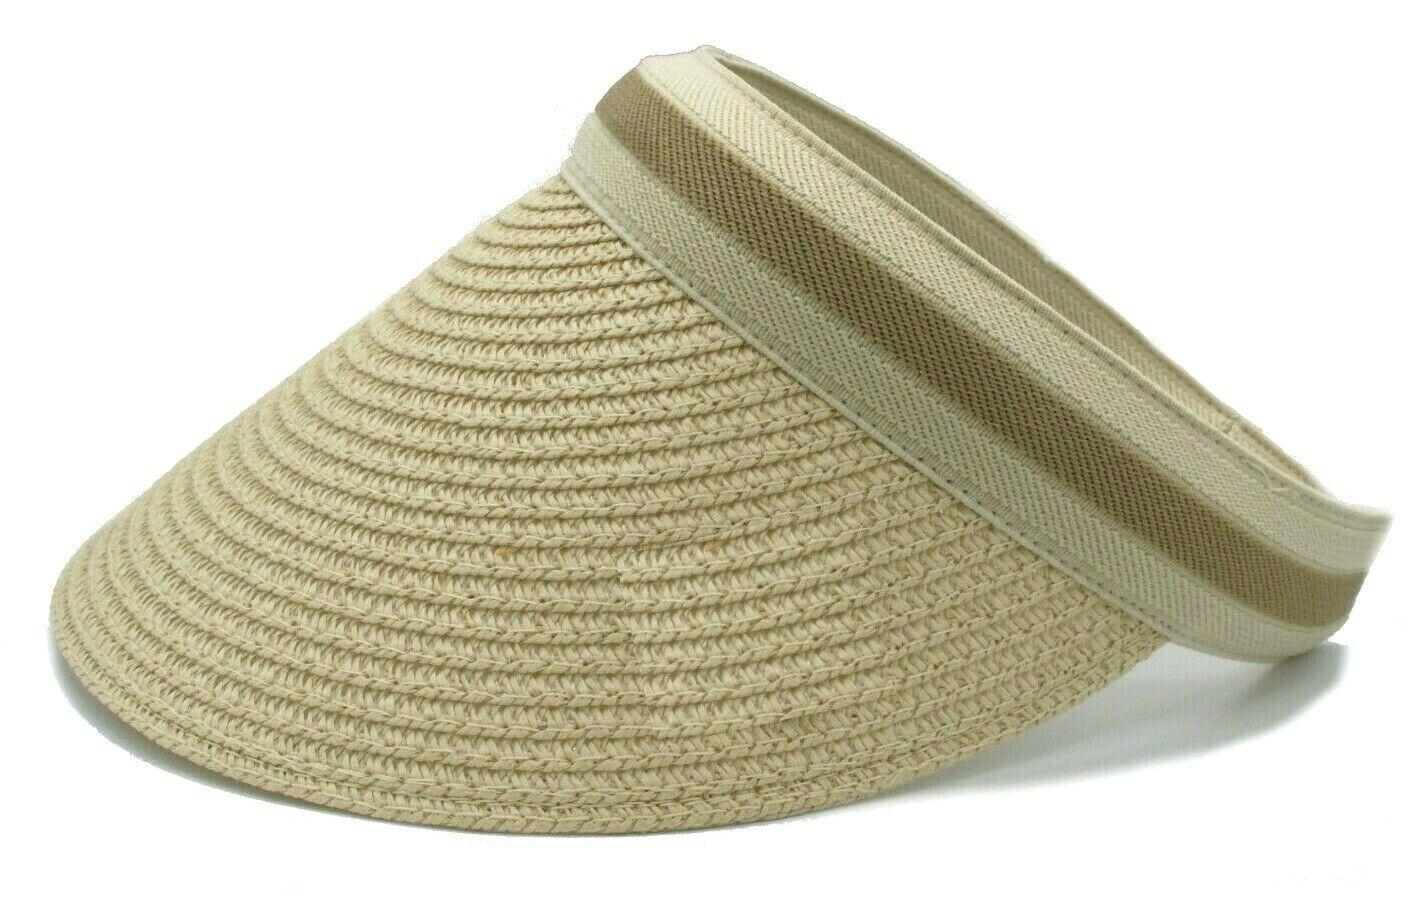 Damen Visor mit Spange Kappe Beige Golfcap Sonnenblende Beach Cap Nature